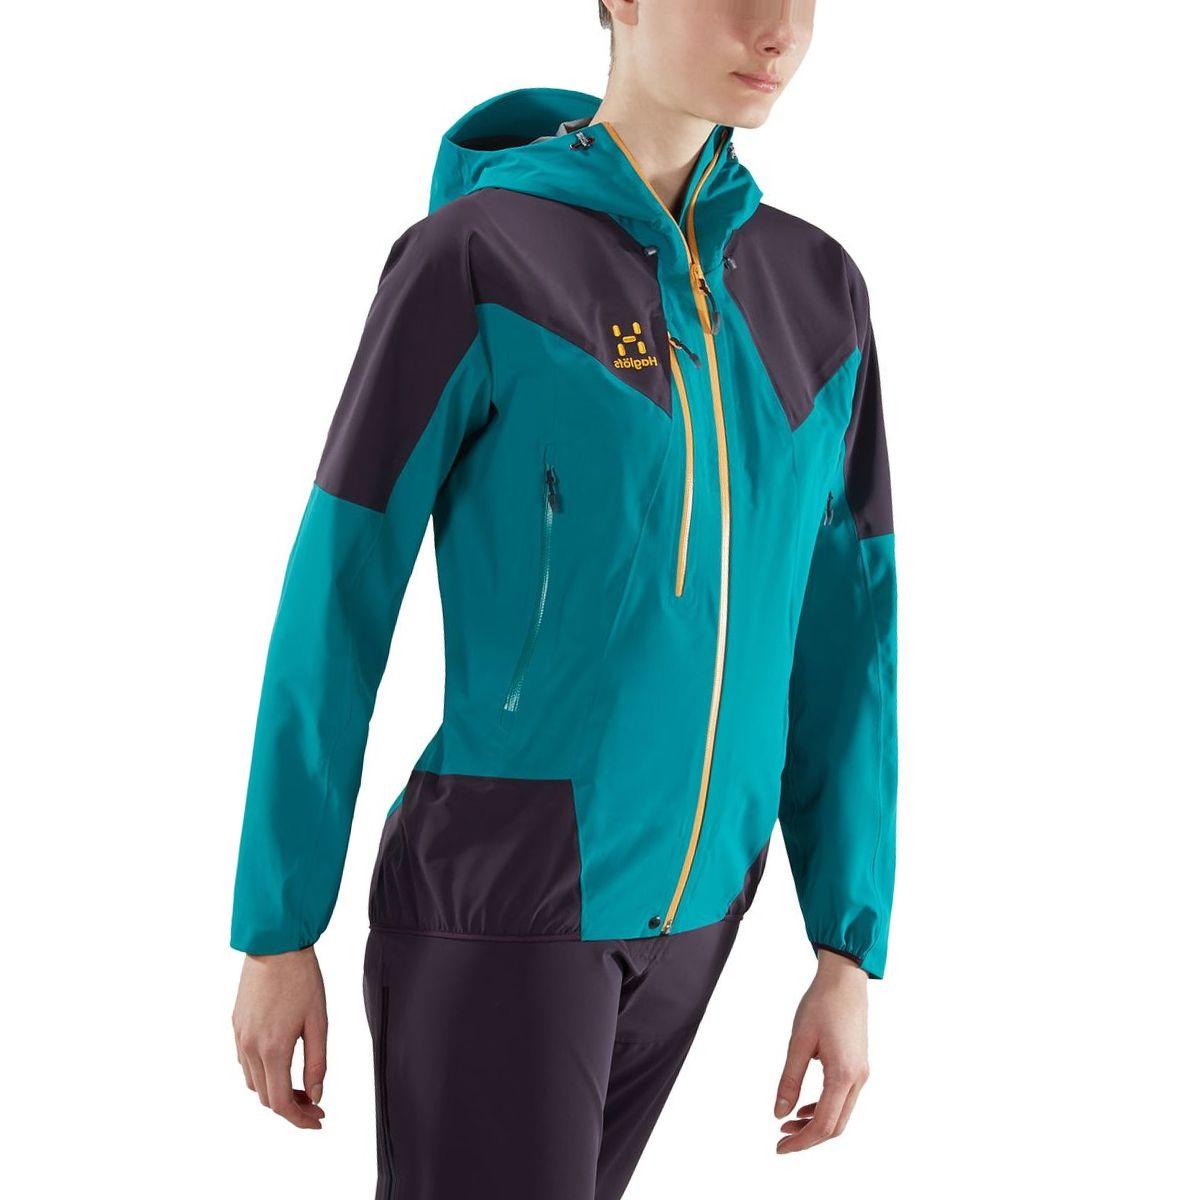 Haglofs L.I.M Touring Proof Jacket - Women's